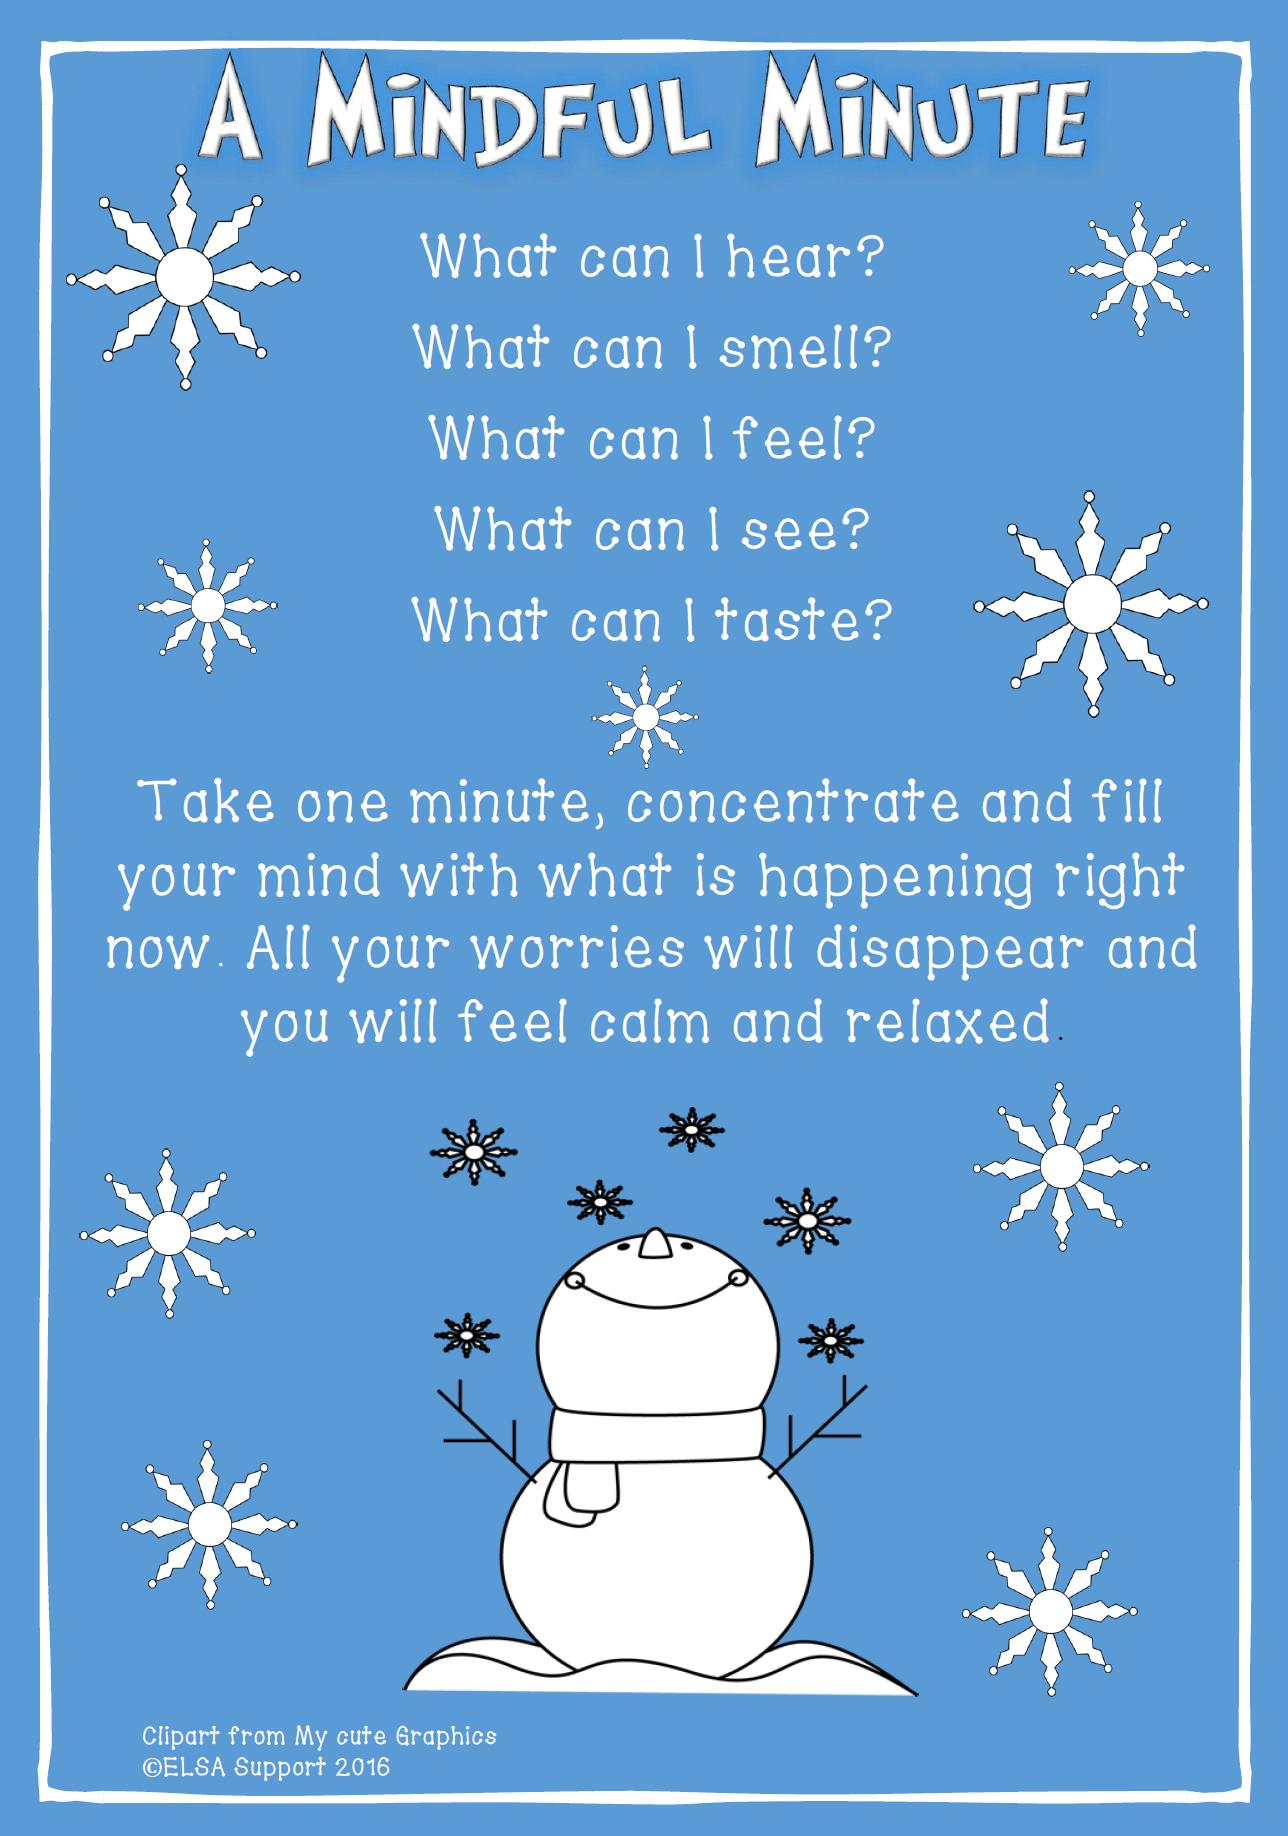 Take a Mindful Minute - Elsa Support